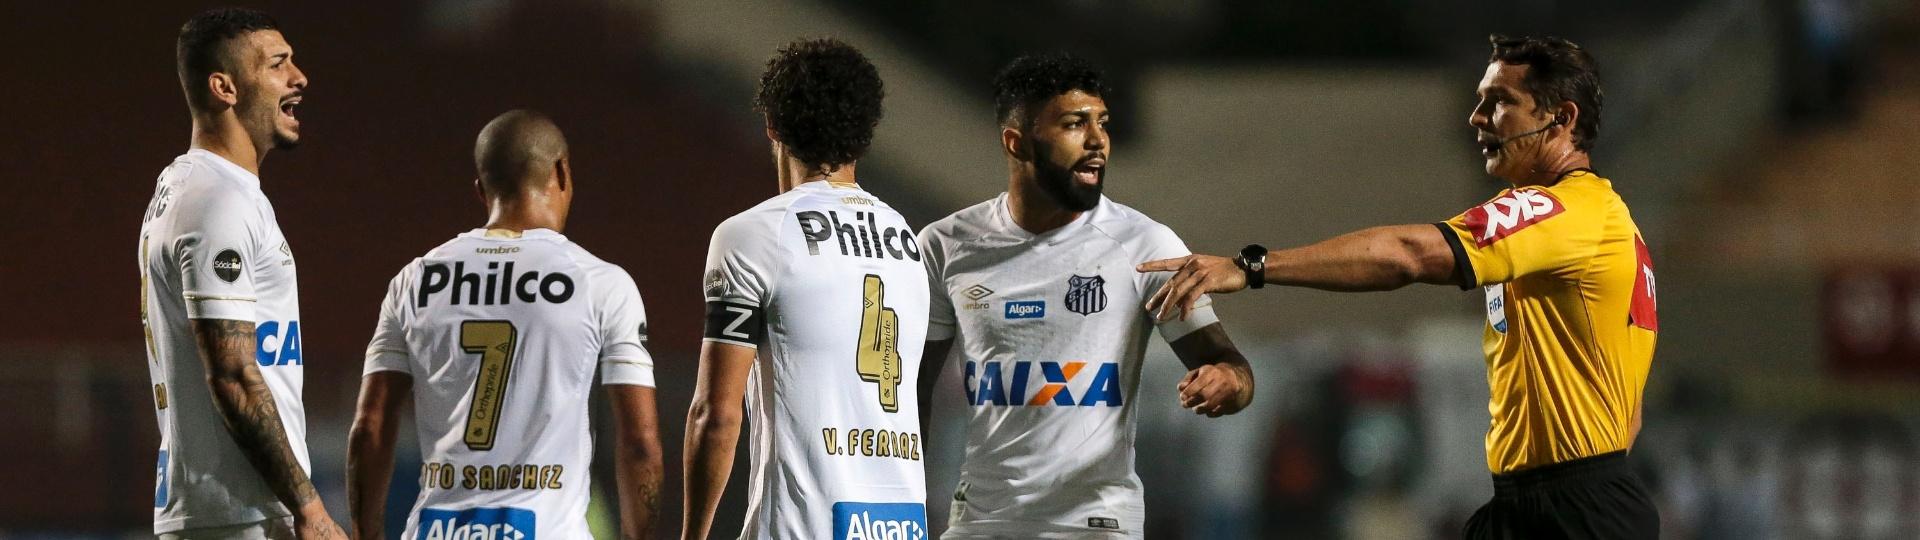 Santos reclama arbitragem Vasco Pacaembu